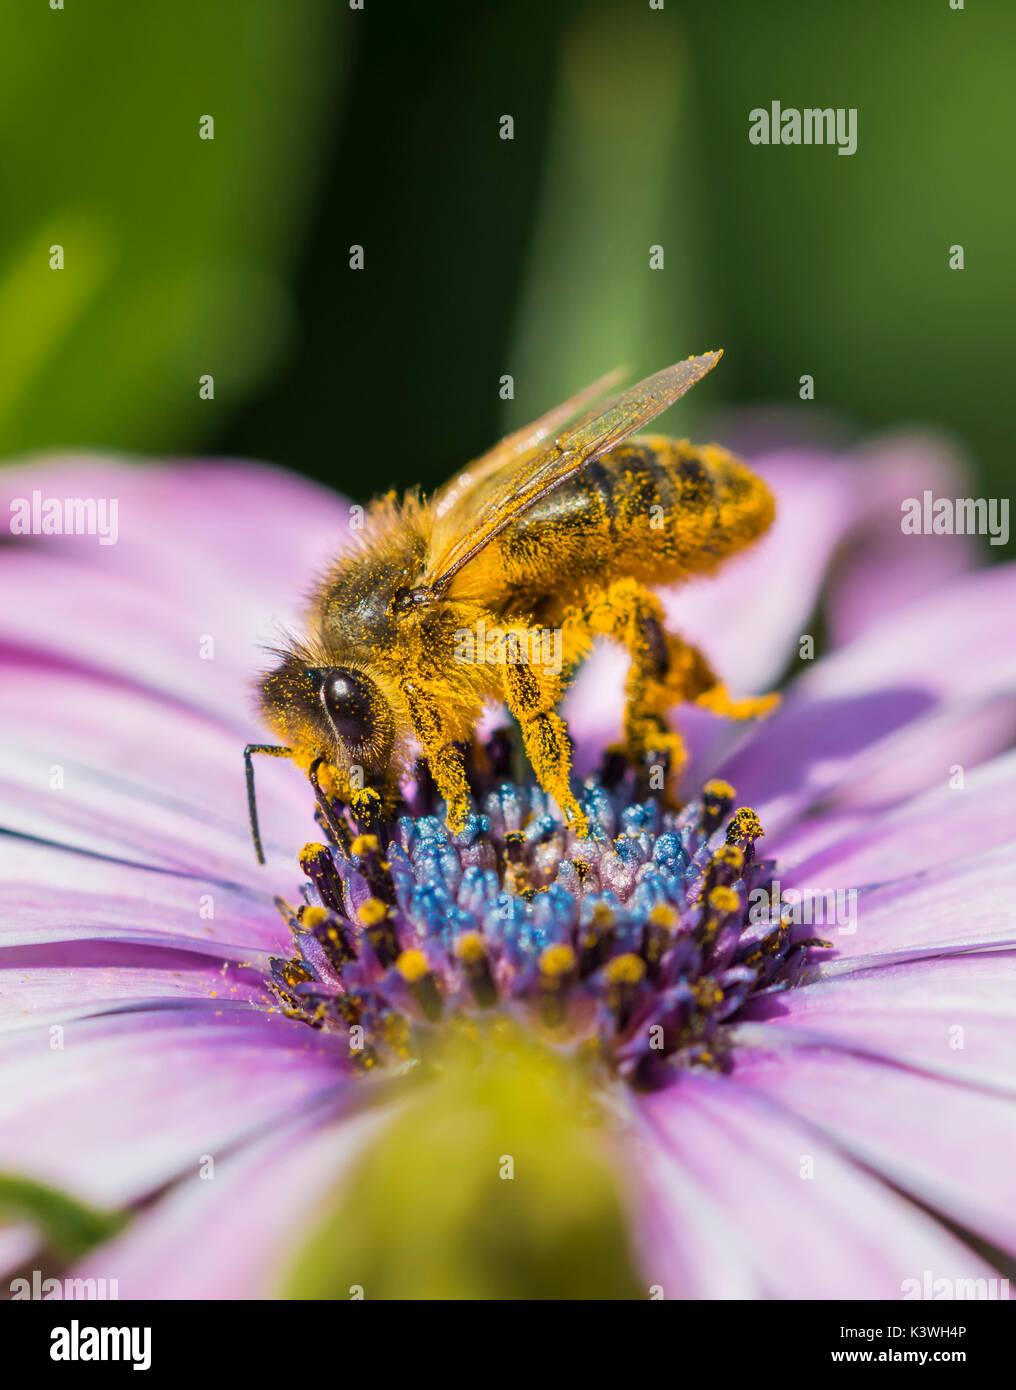 apis-mellifera-european-honey-bee-on-a-c